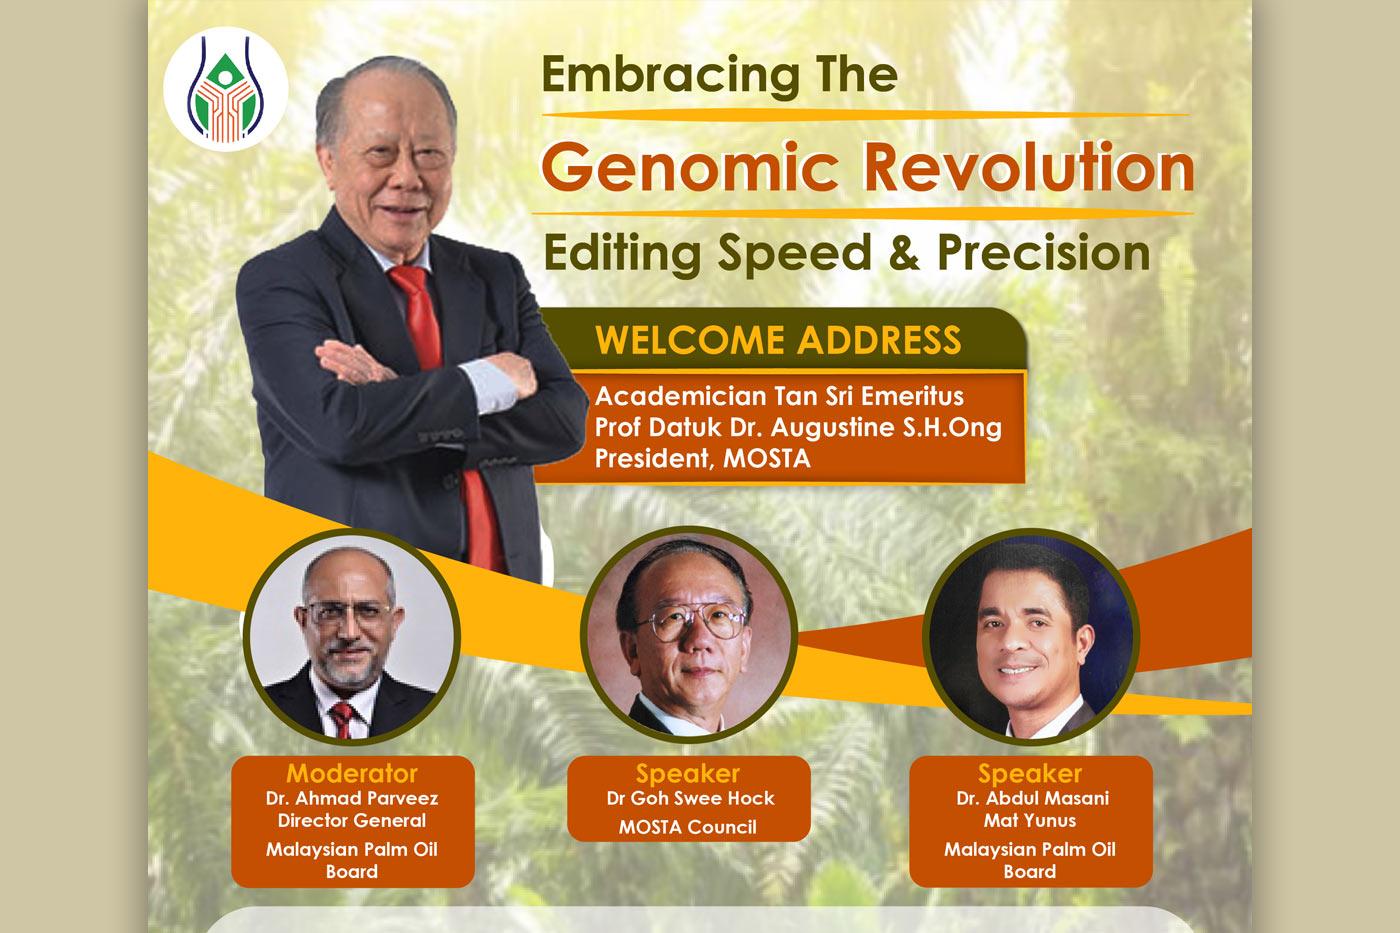 EMBRACING THE GENOMIC REVOLUTION